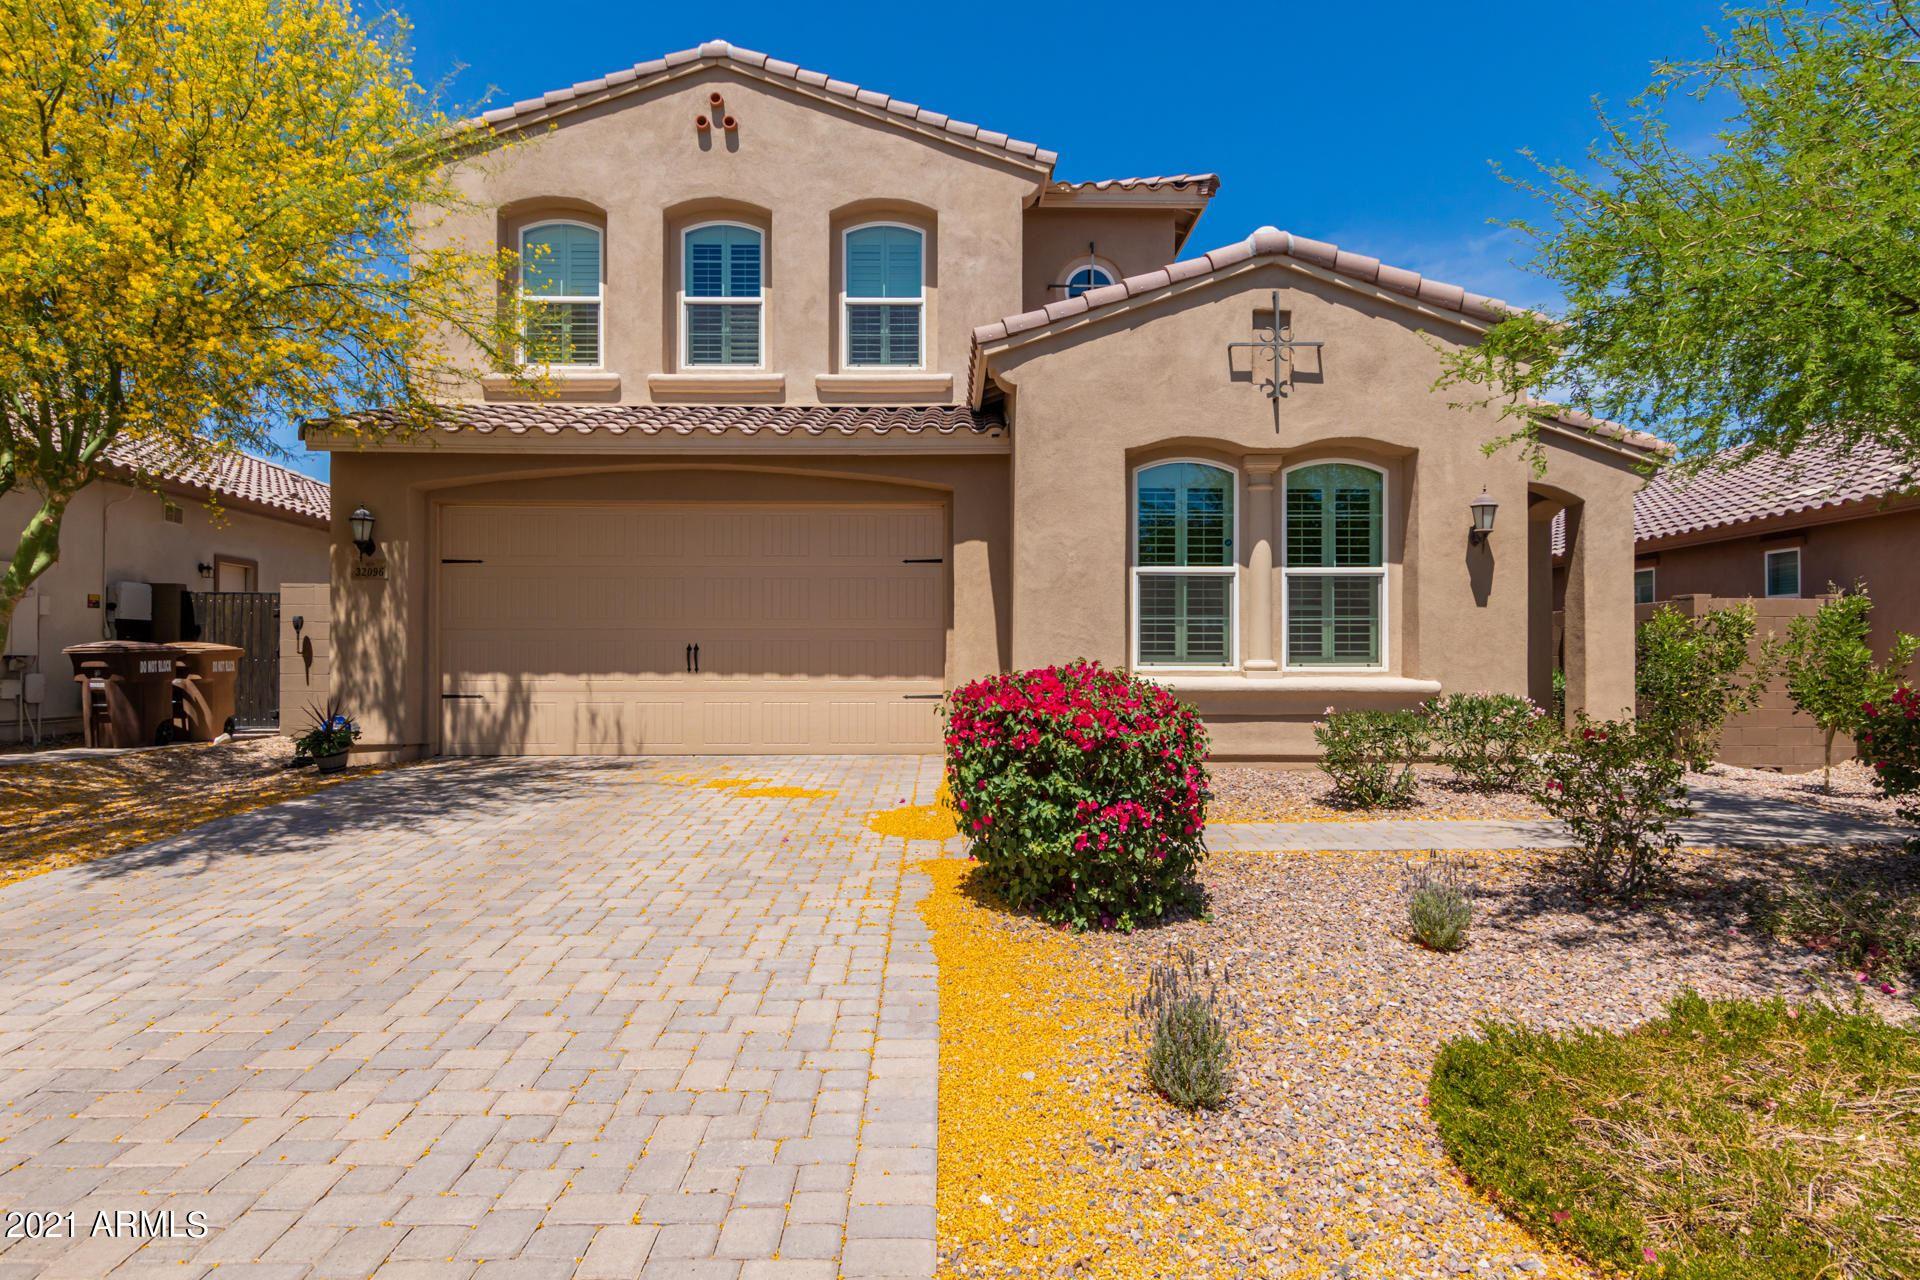 Photo of 32096 N 132ND Drive, Peoria, AZ 85383 (MLS # 6228618)